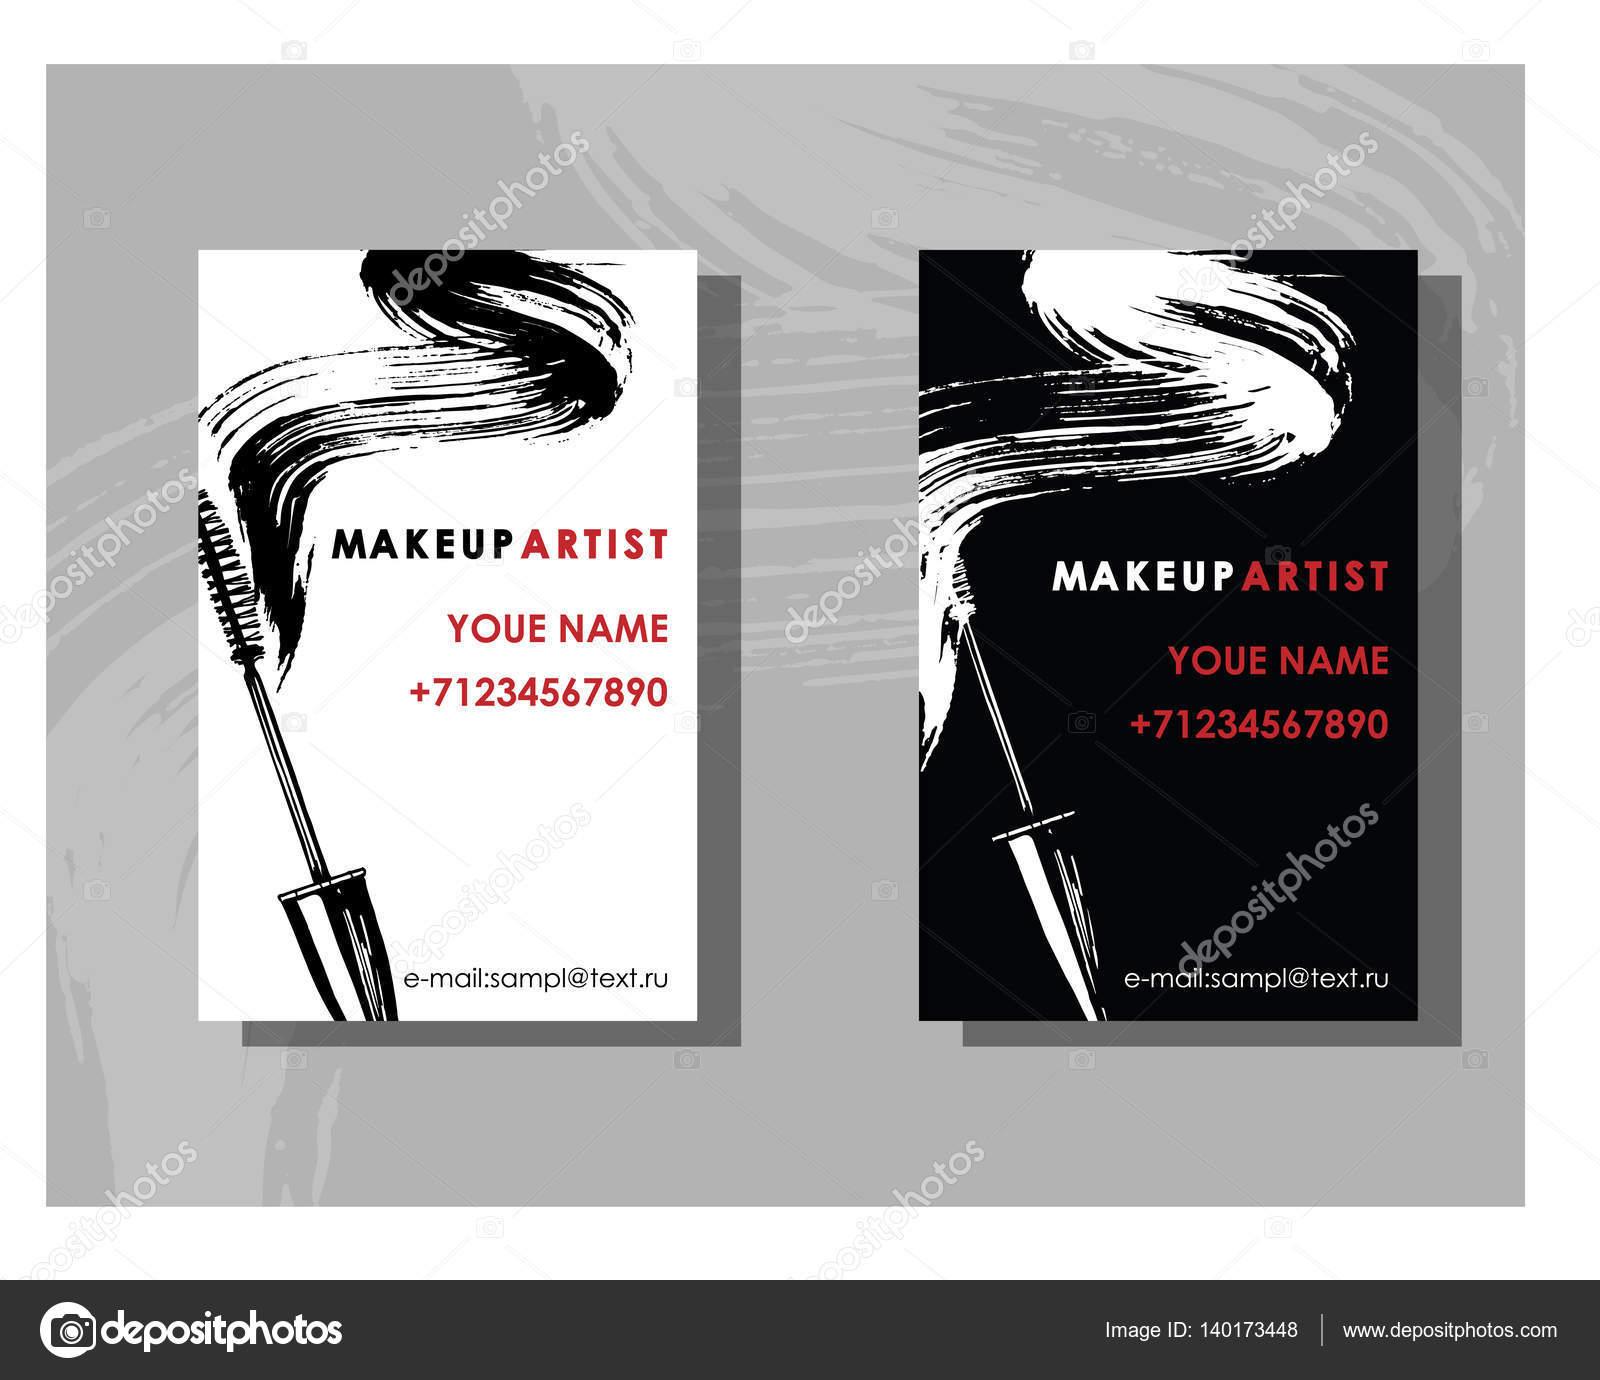 makeup artist business card vector template with makeup items